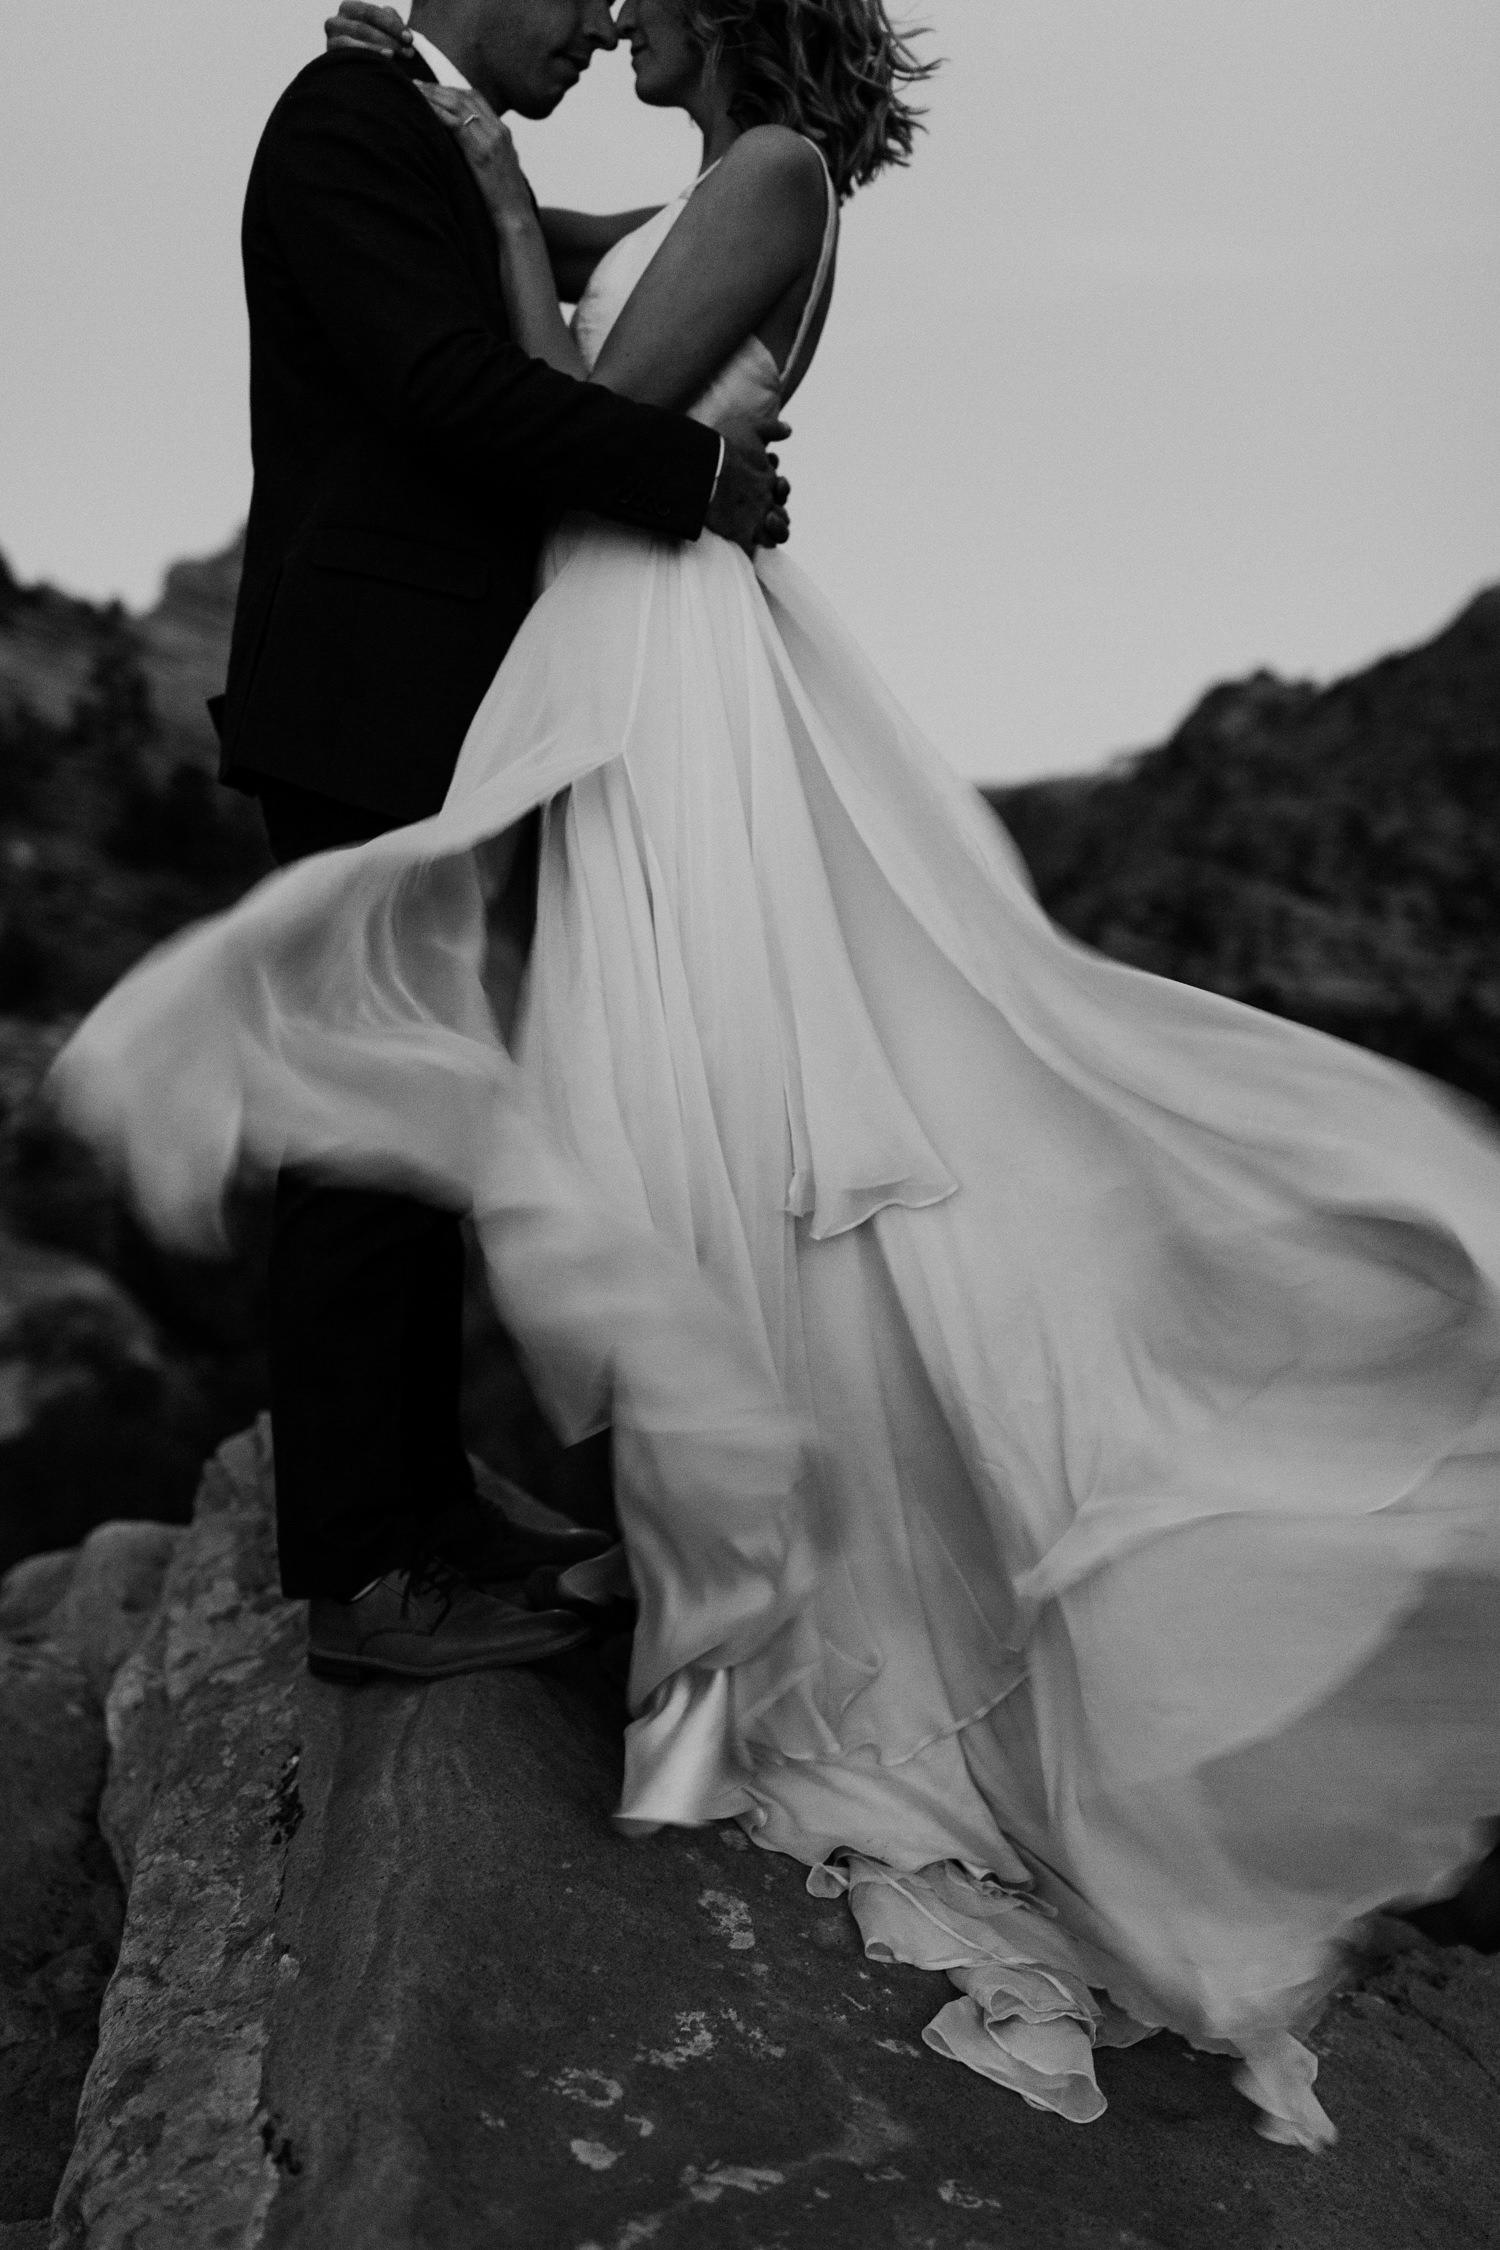 17-12-adventure-wedding-photographer-7.jpg